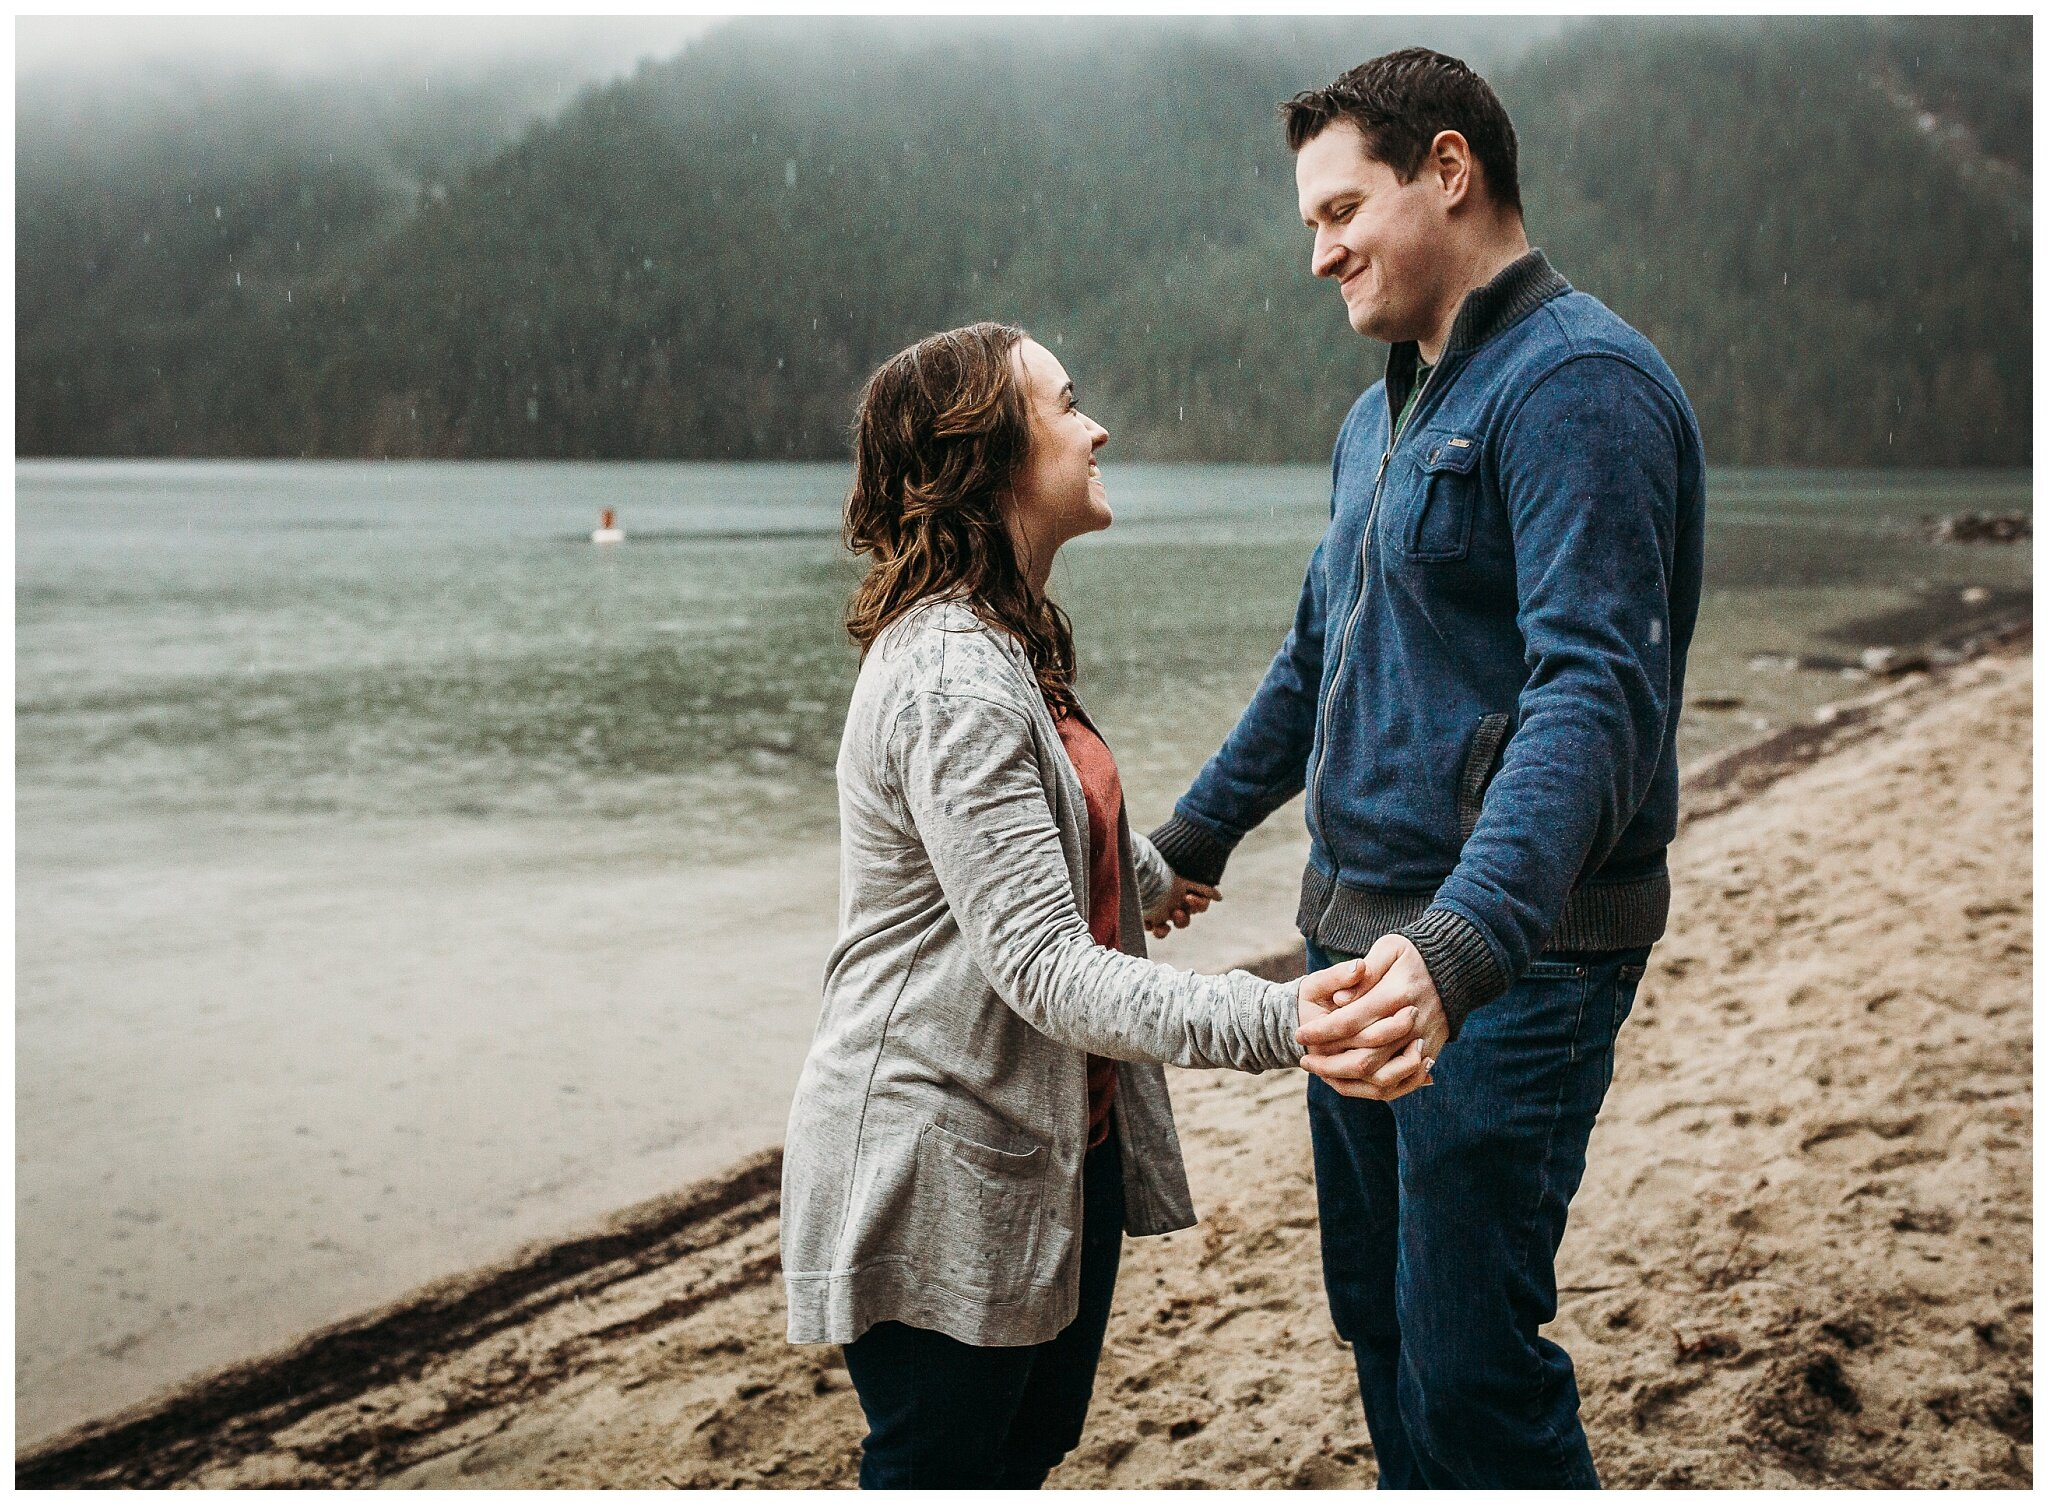 Chilliwack Lake Rainy Winter Engagement Photography Session Couples Photographer_0017.jpg